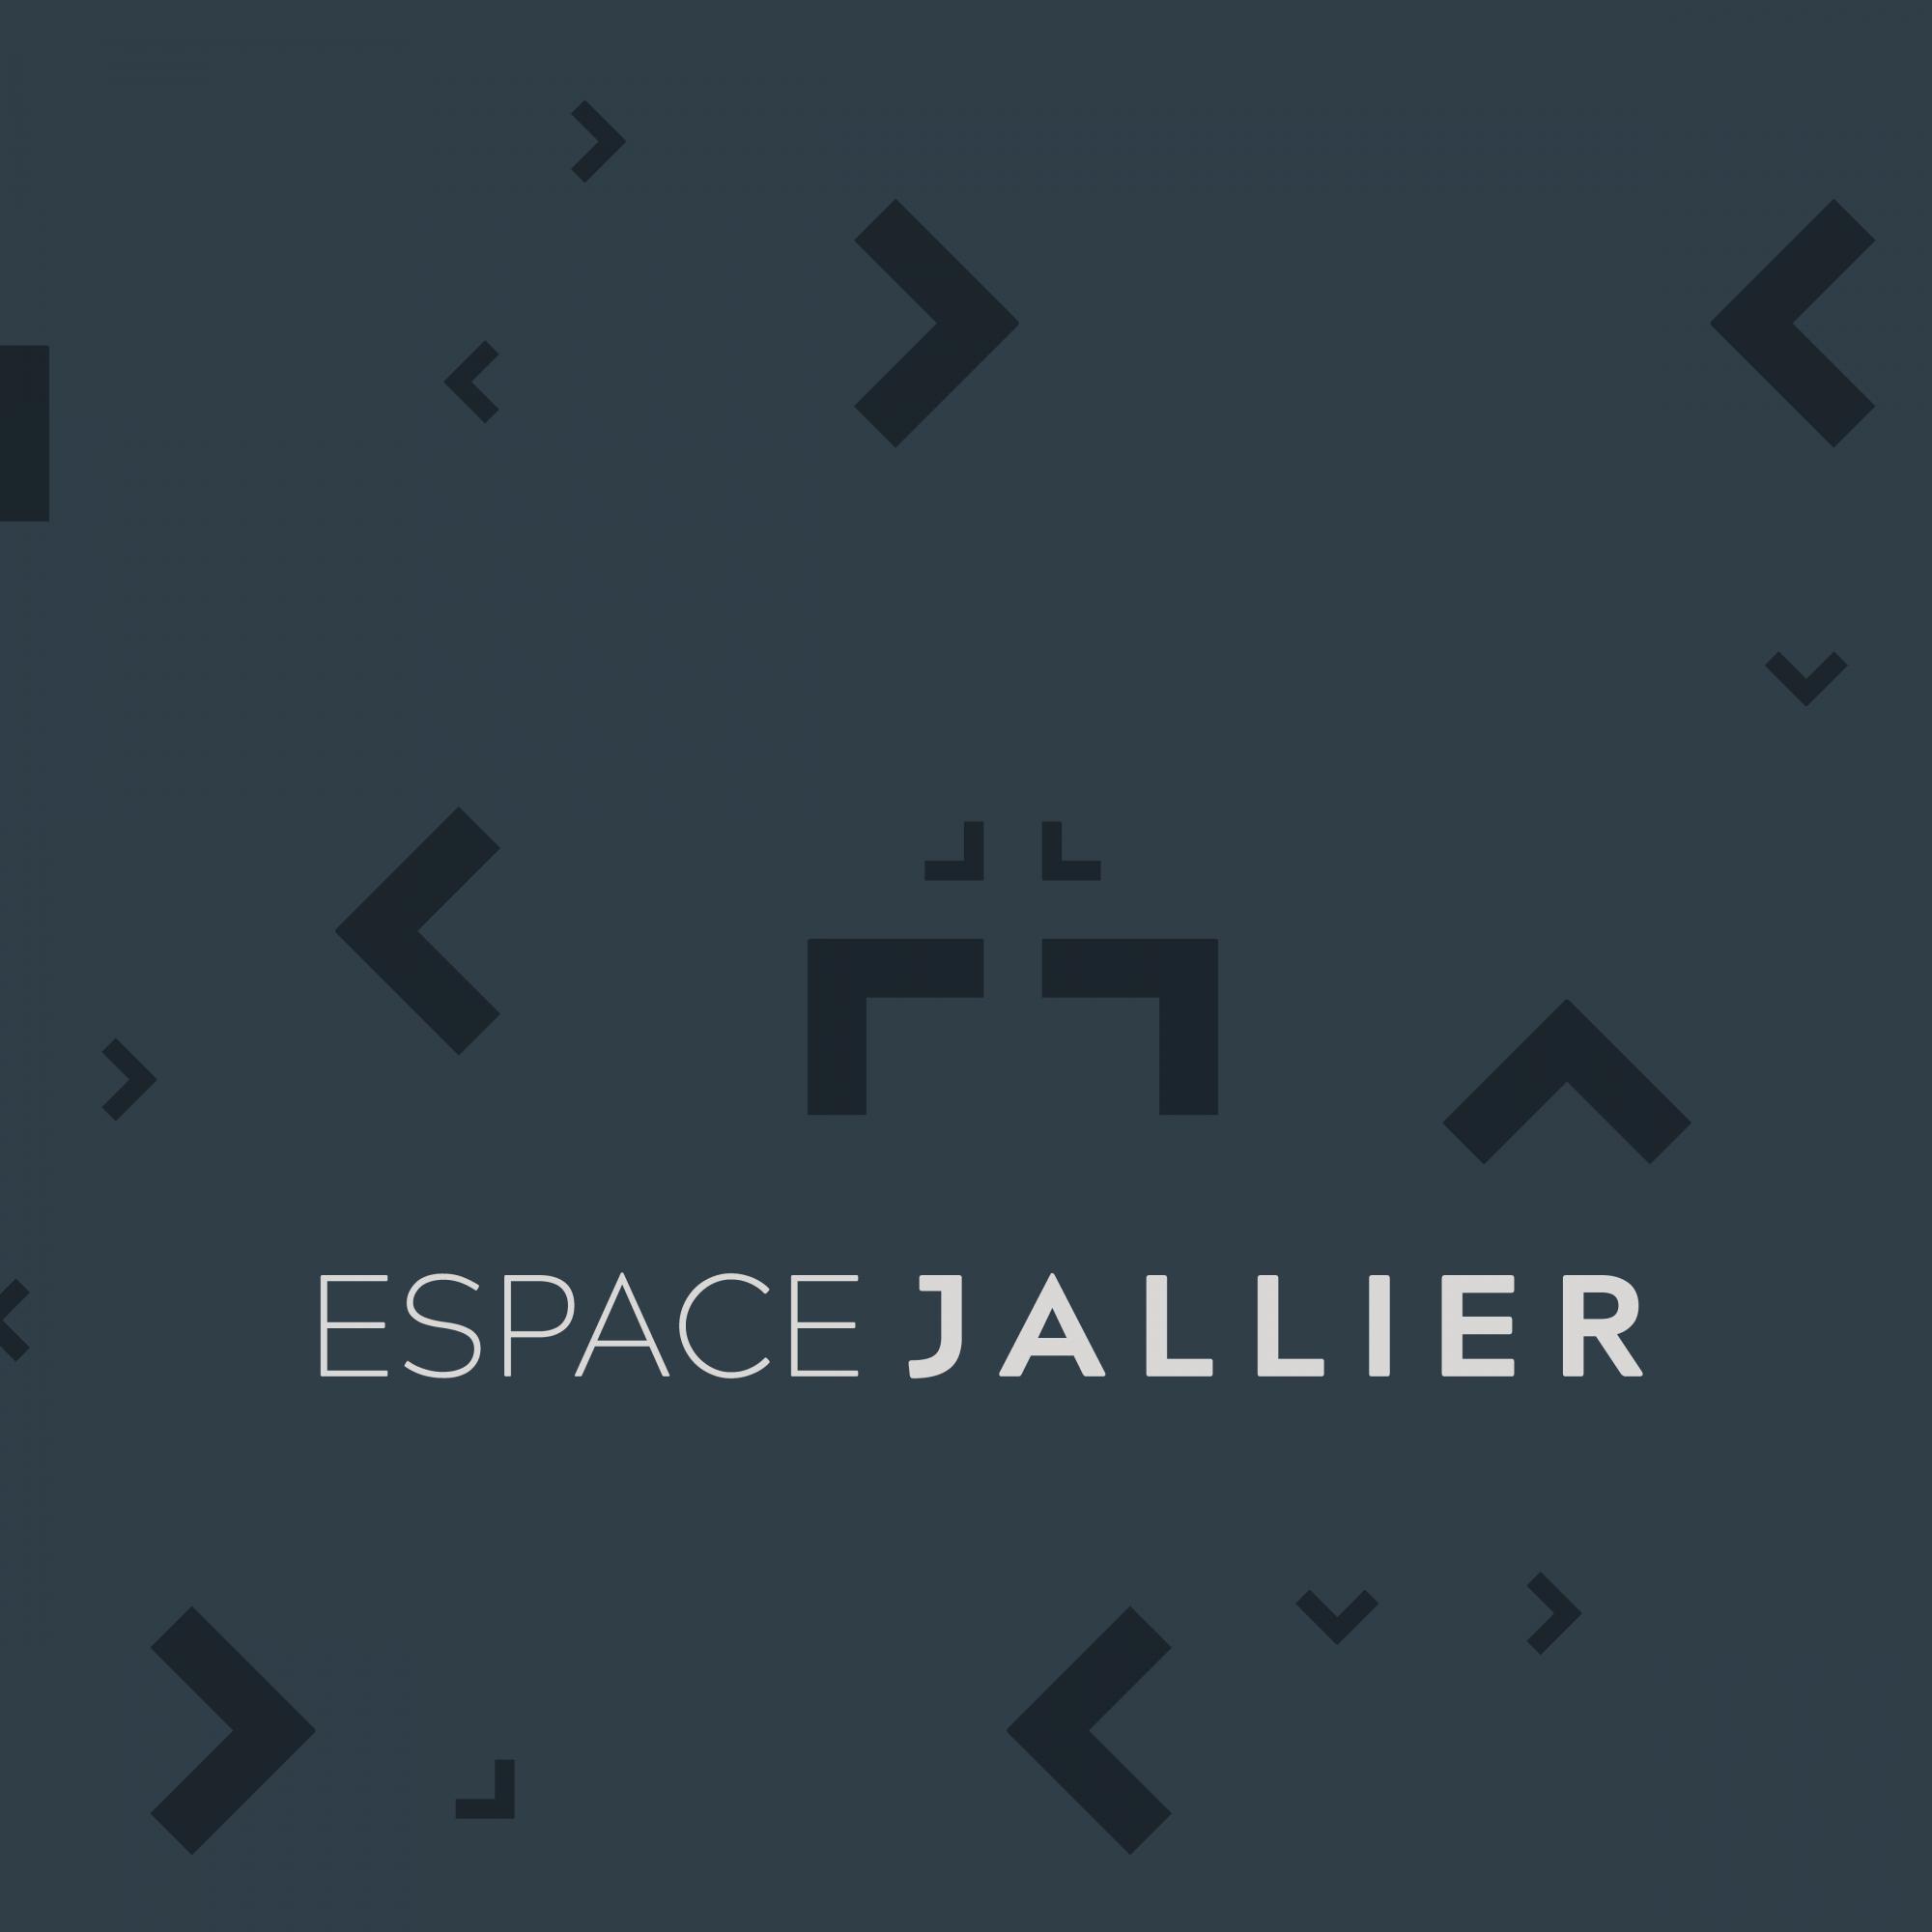 espace jallier1